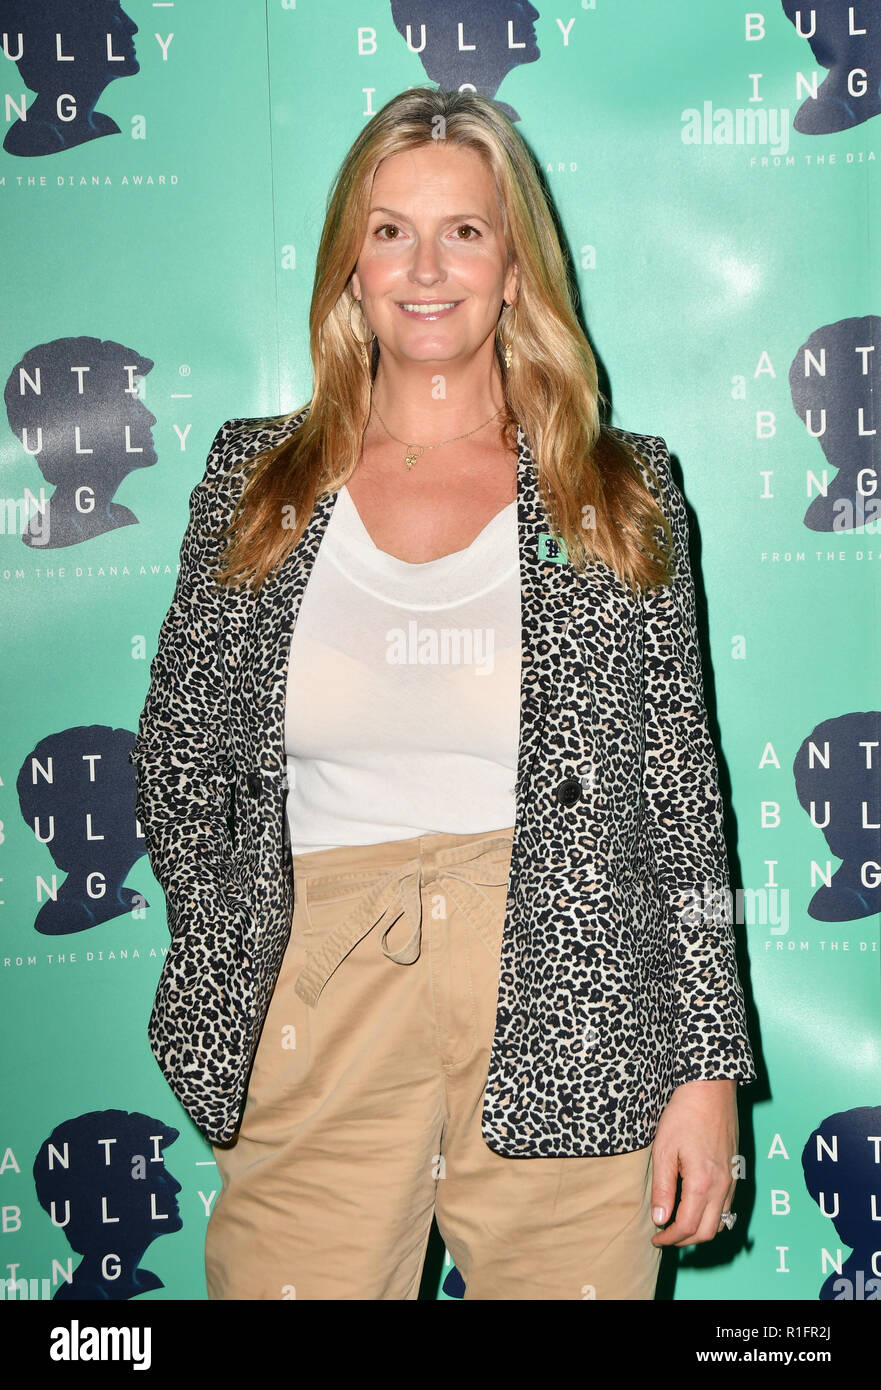 London, UK. 12th November, 2018. Penny Lancaster attend The Diana Award anti